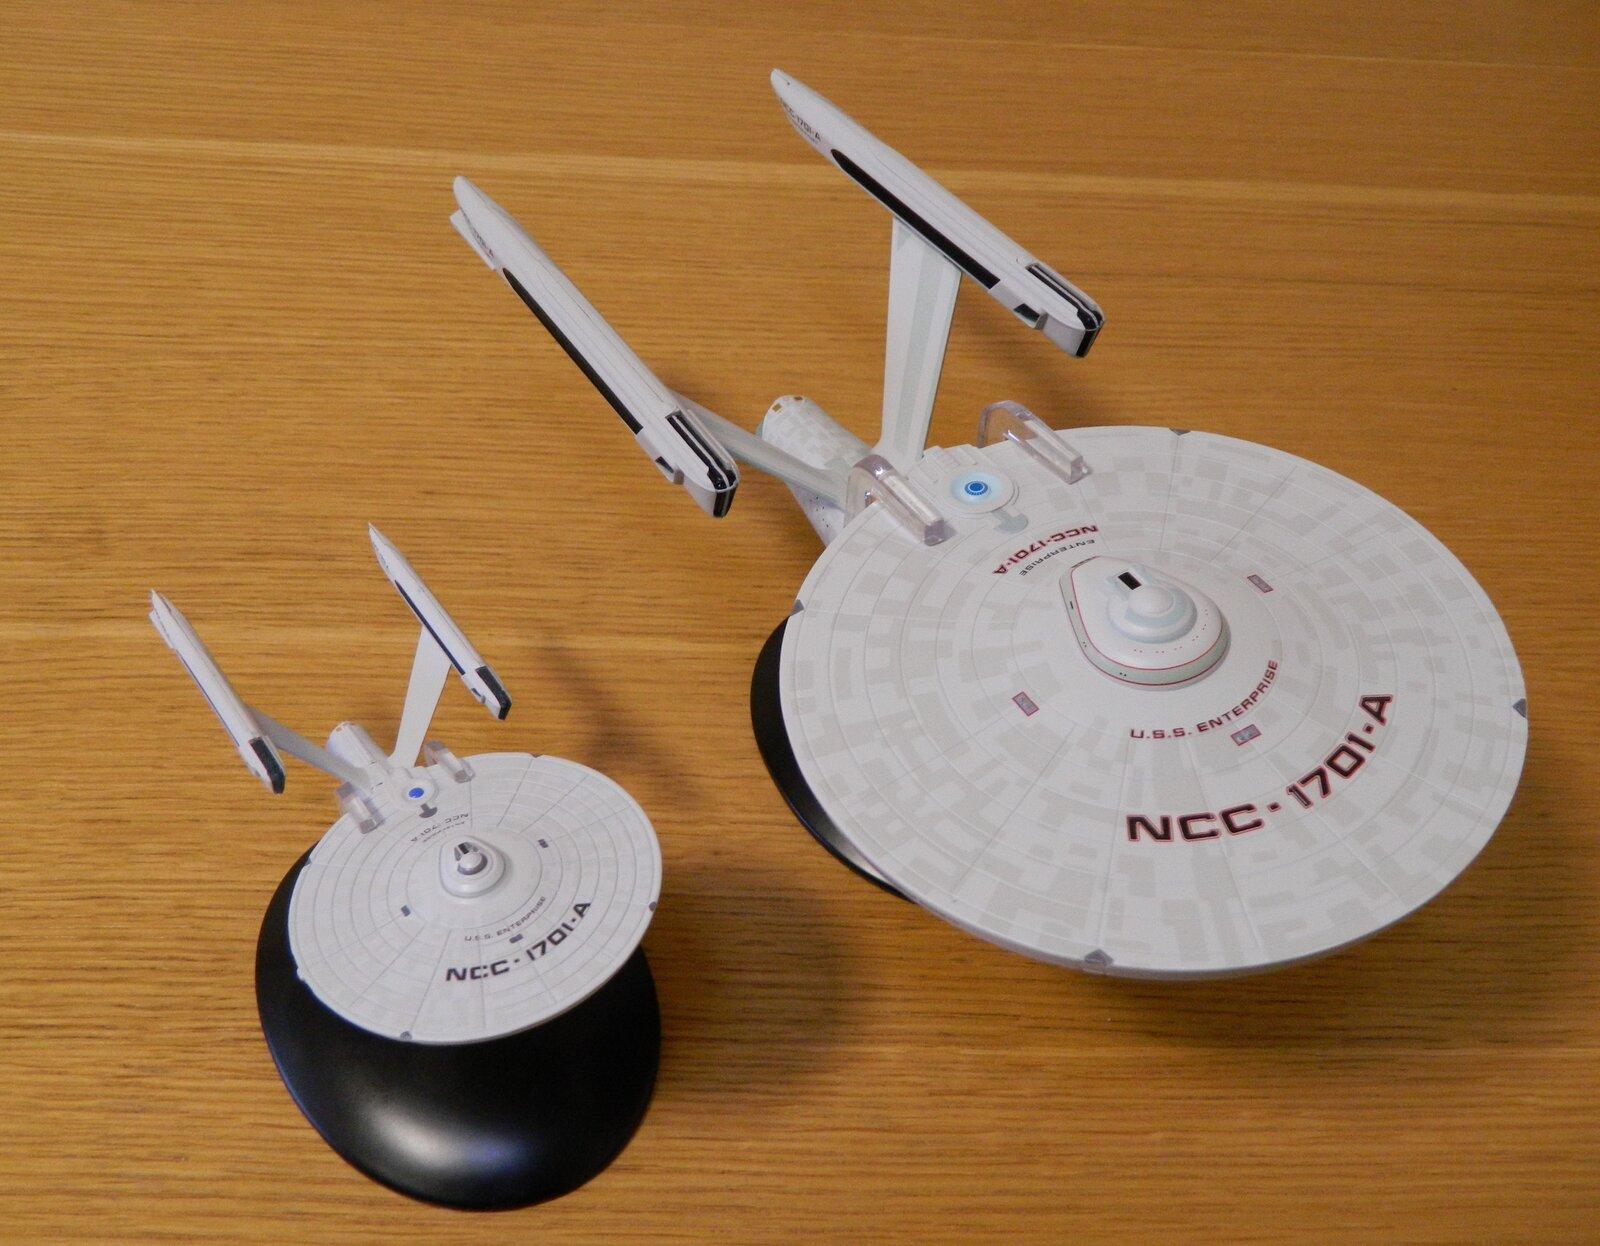 EnterpriseAcomparison.jpg